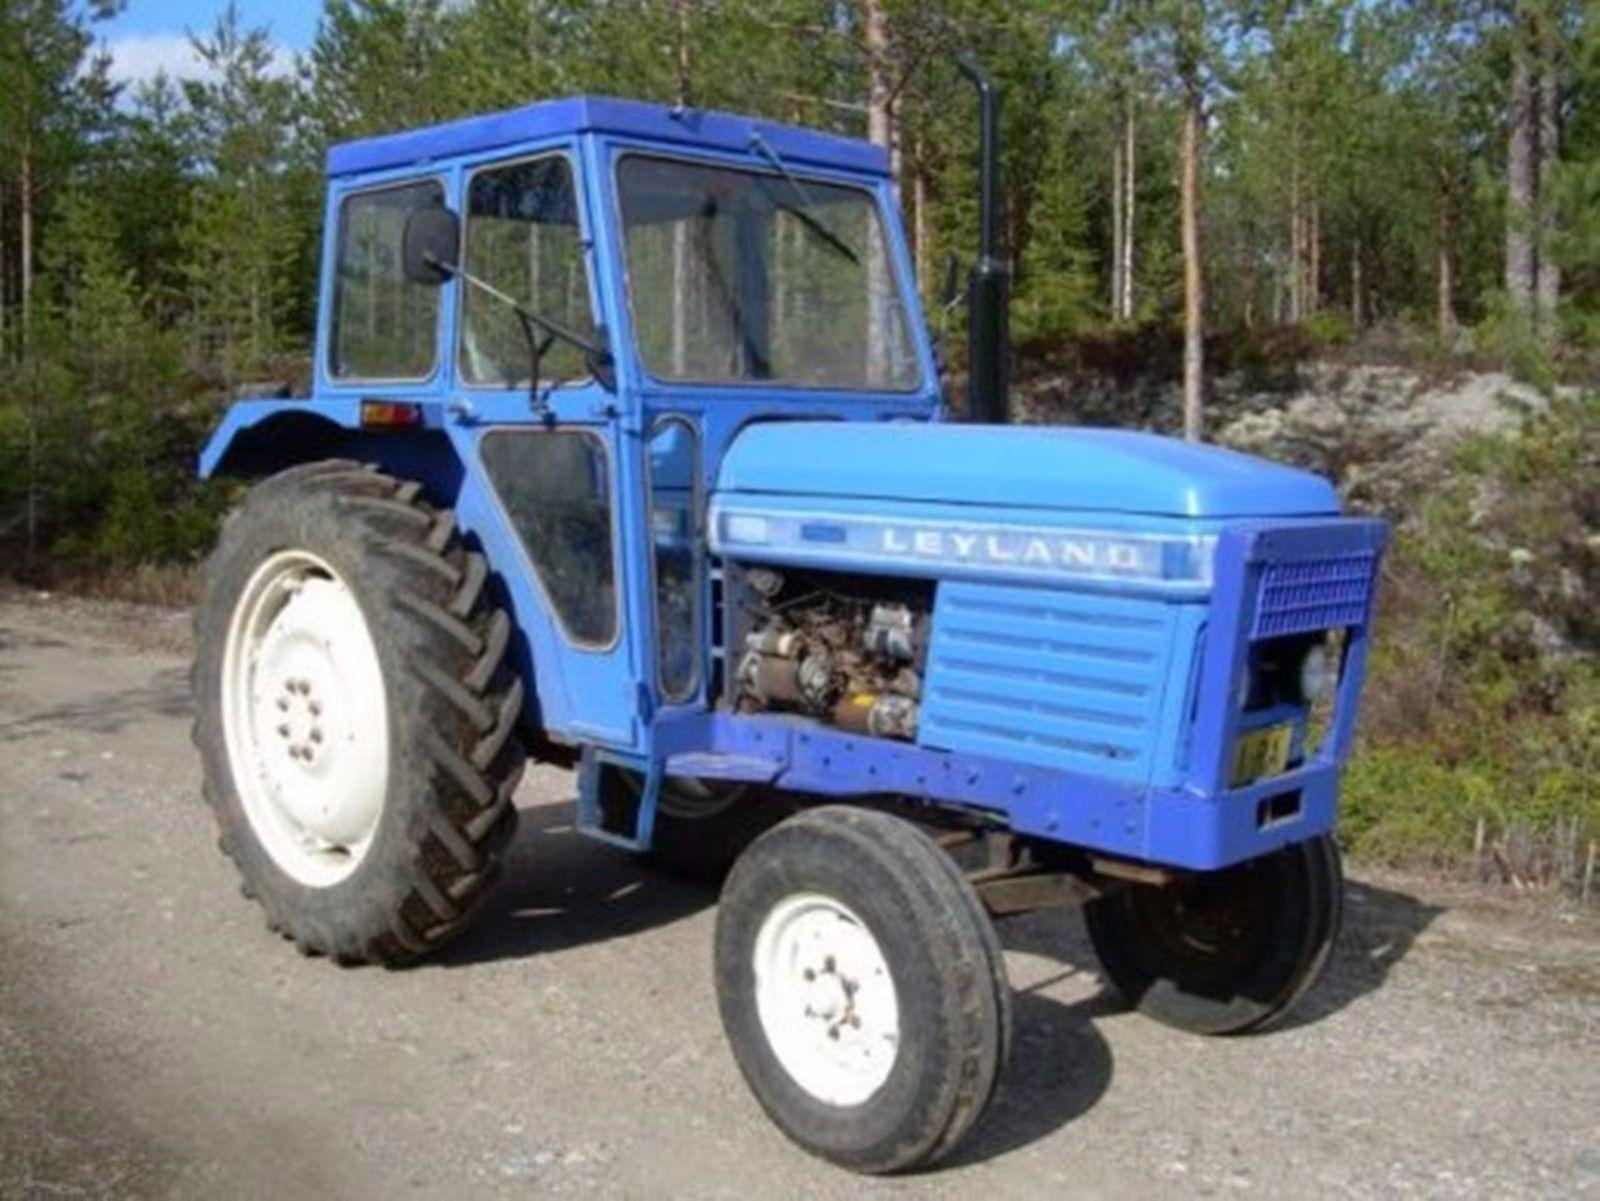 leyland 255 270 tractor workshop manual 3 40 picclick uk rh picclick co uk leyland 270 tractor repair workshop manual Leyland 270 Tractor Brakes